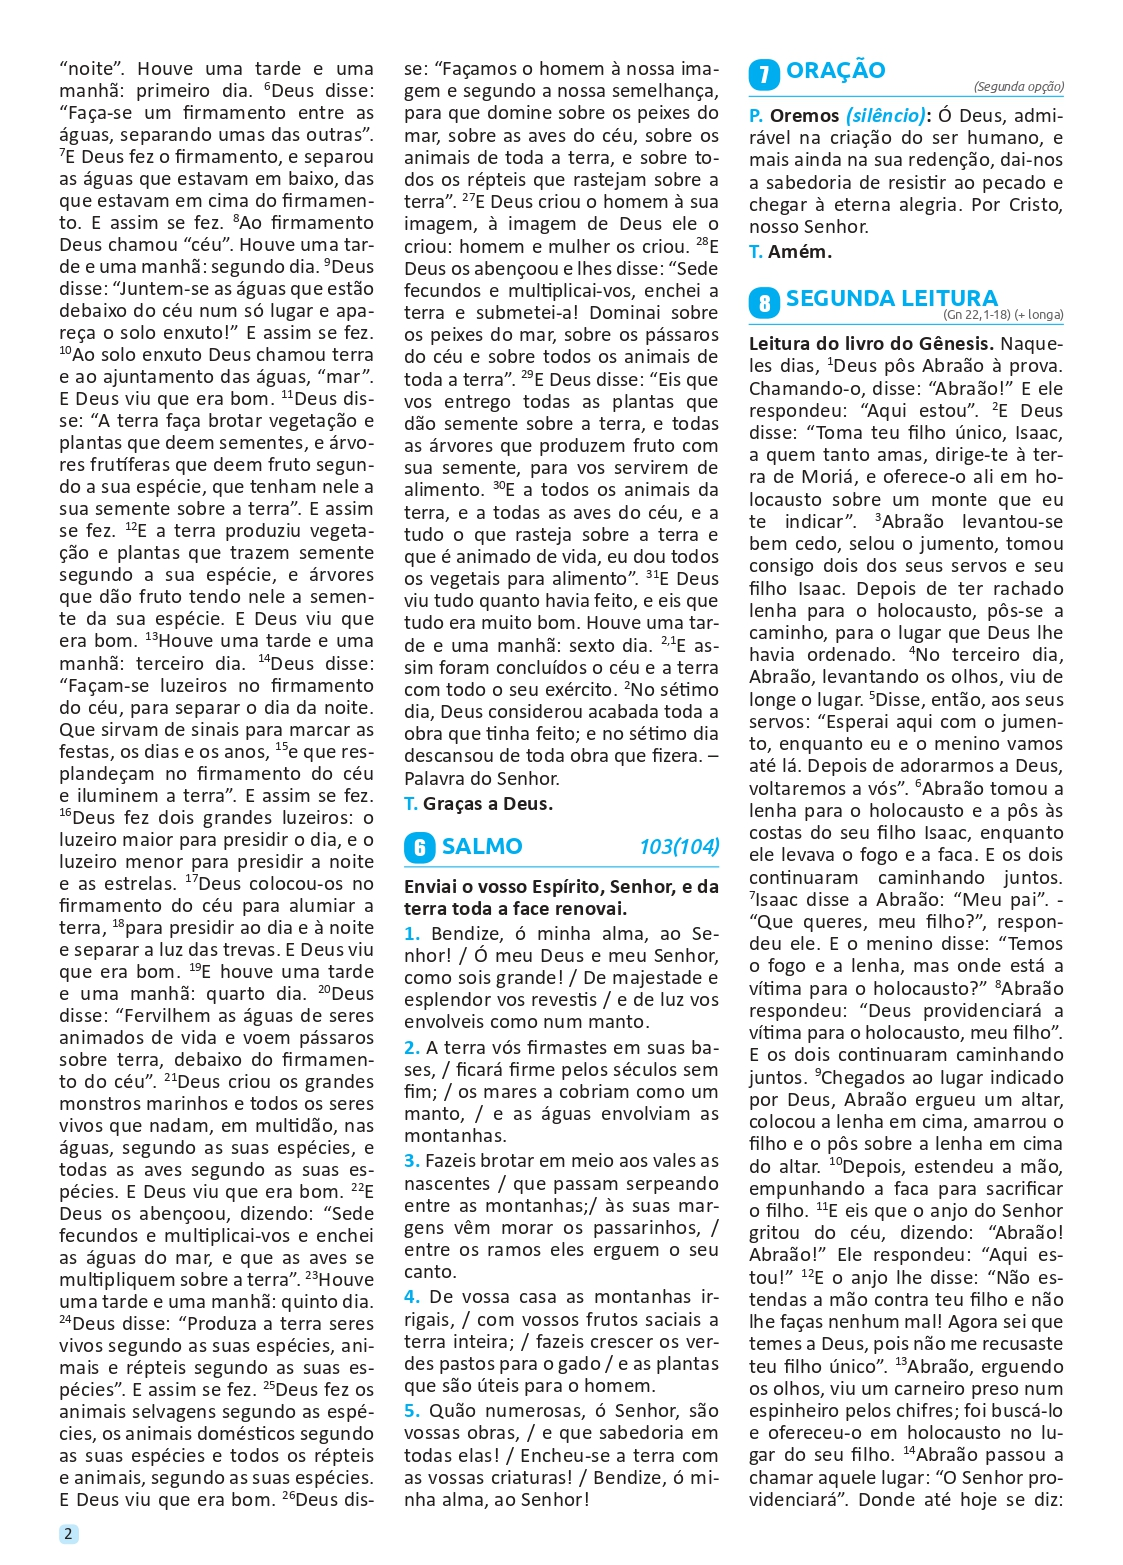 ano_44-a_-_20_-_sabado_santo_vigilia_pascal_2_pages-to-jpg-0002